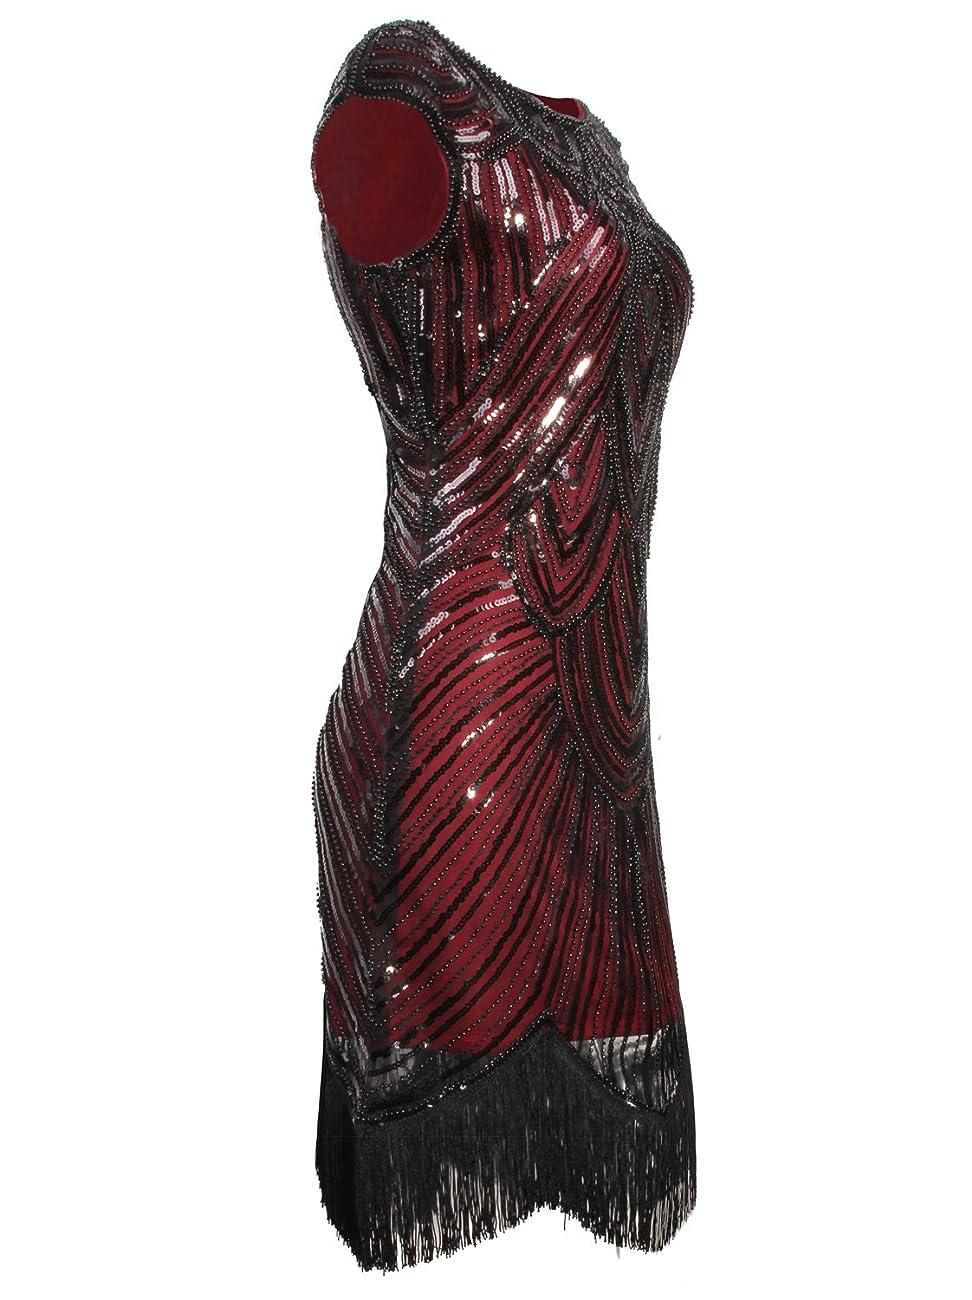 Vijiv Art Deco Great Gatsby Inspired Tassel Beaded 1920s Flapper Dress 1